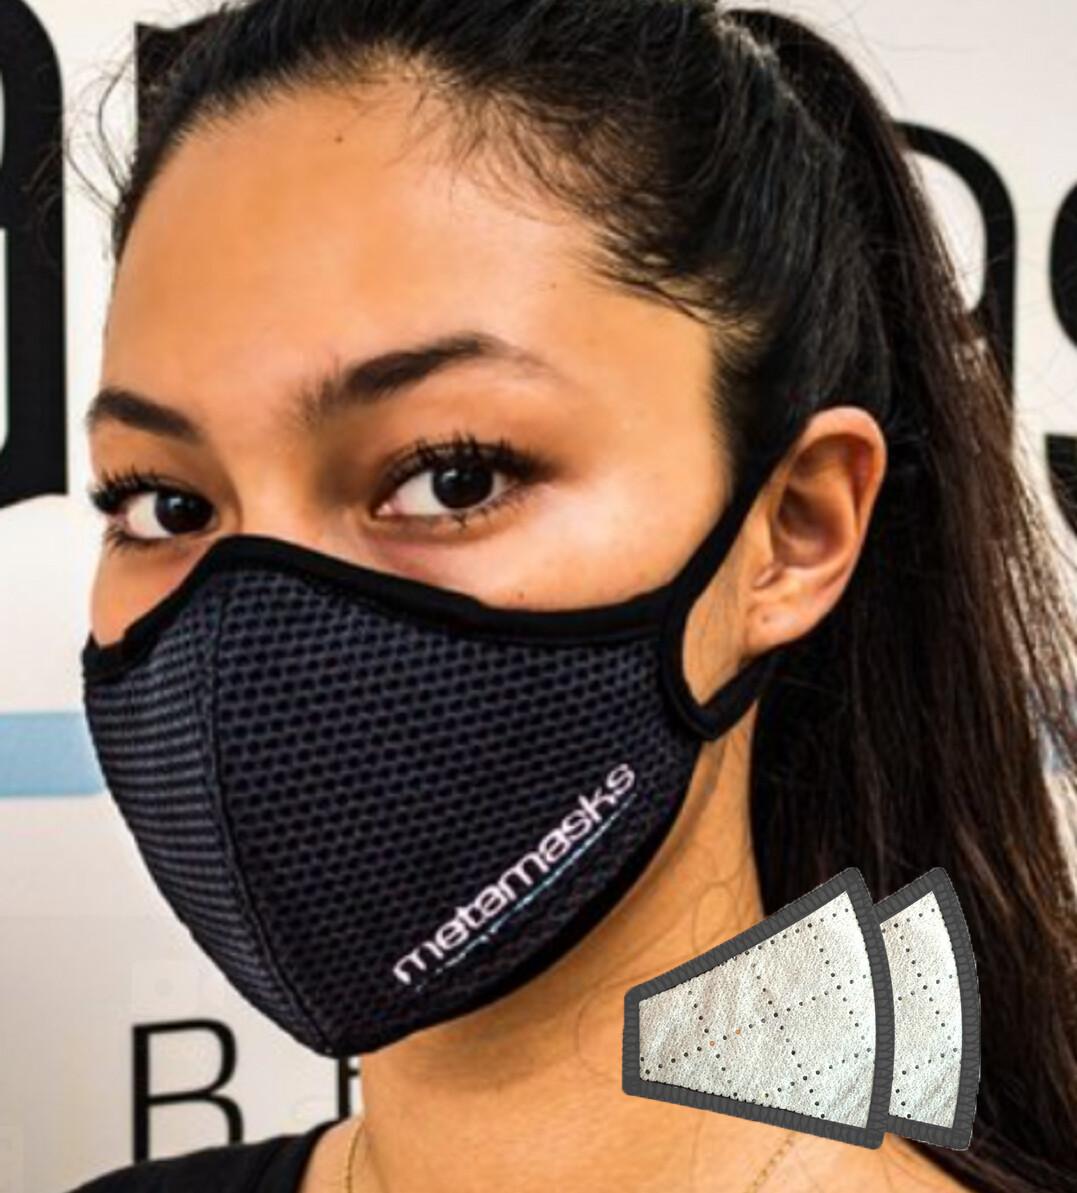 Metamasks Embroidered Logo Face mask Replaceable Filter